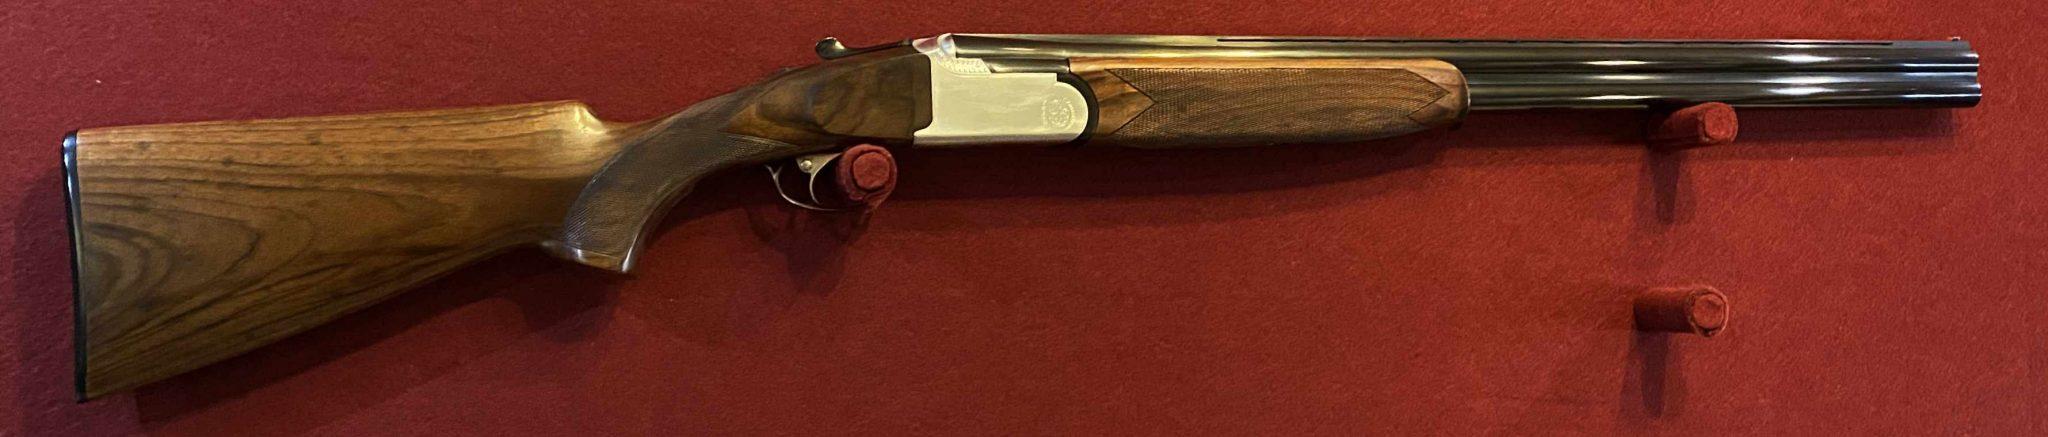 used shotgun for sale